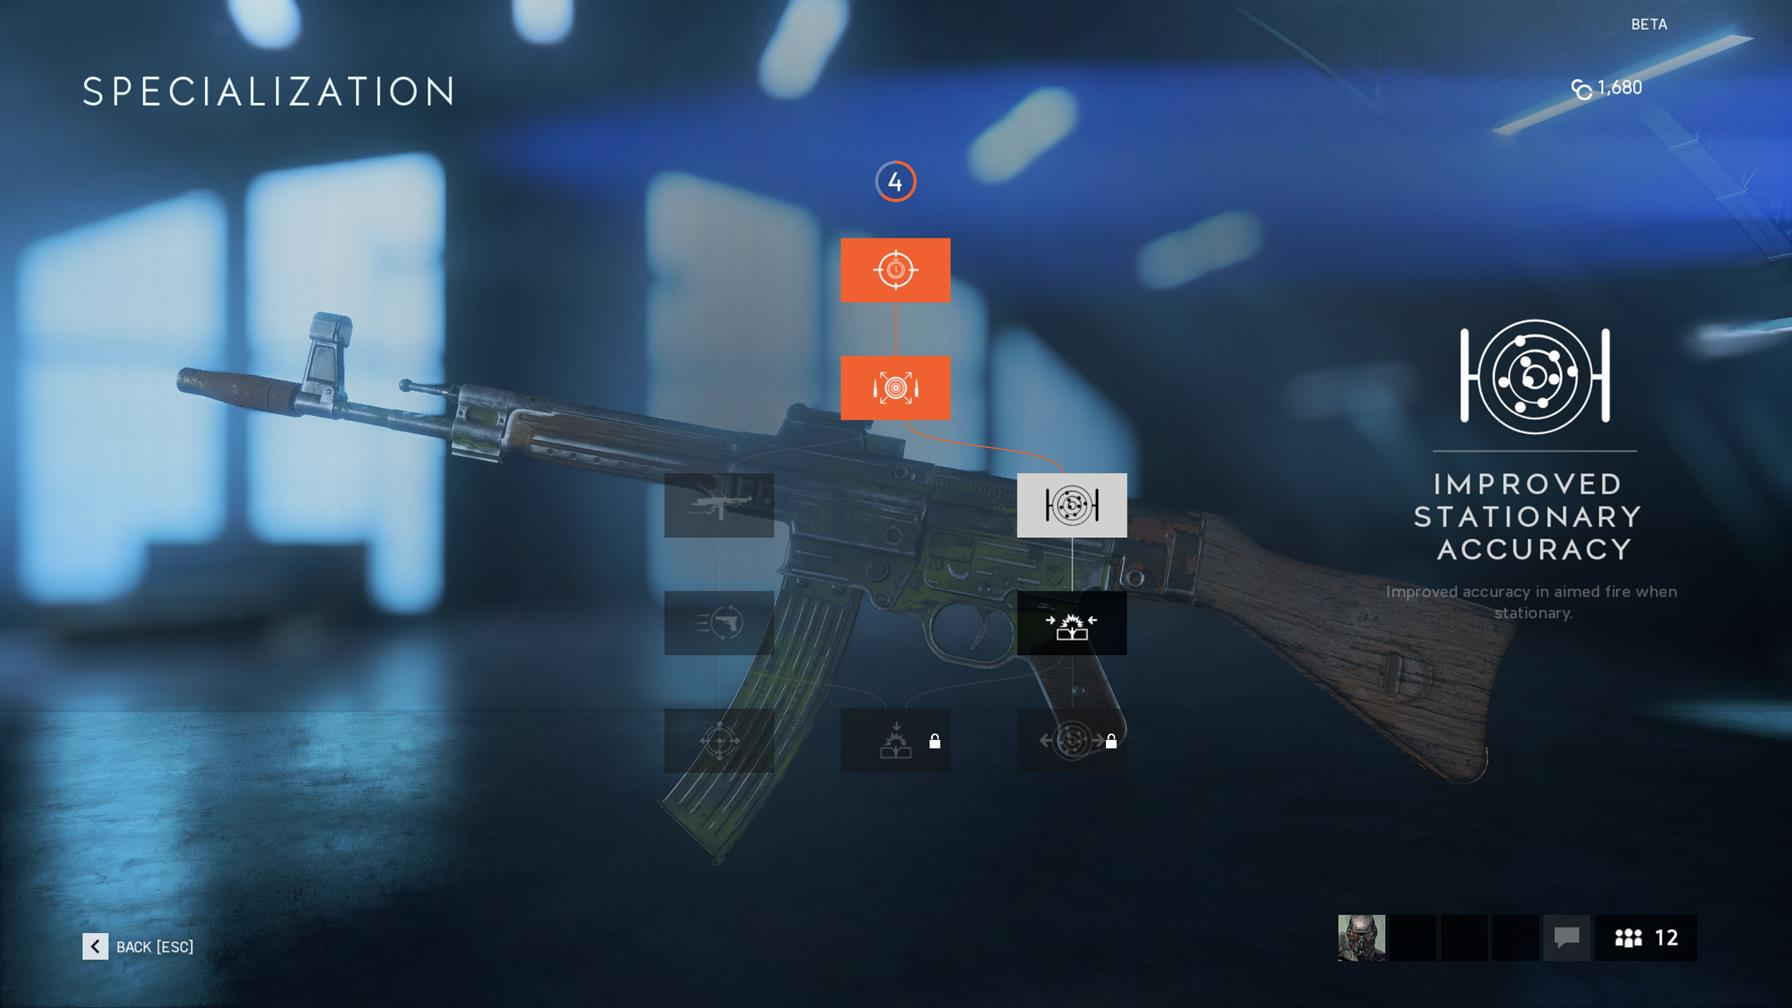 Battlefield 5 multiplayer guide: Attrition, Specializations